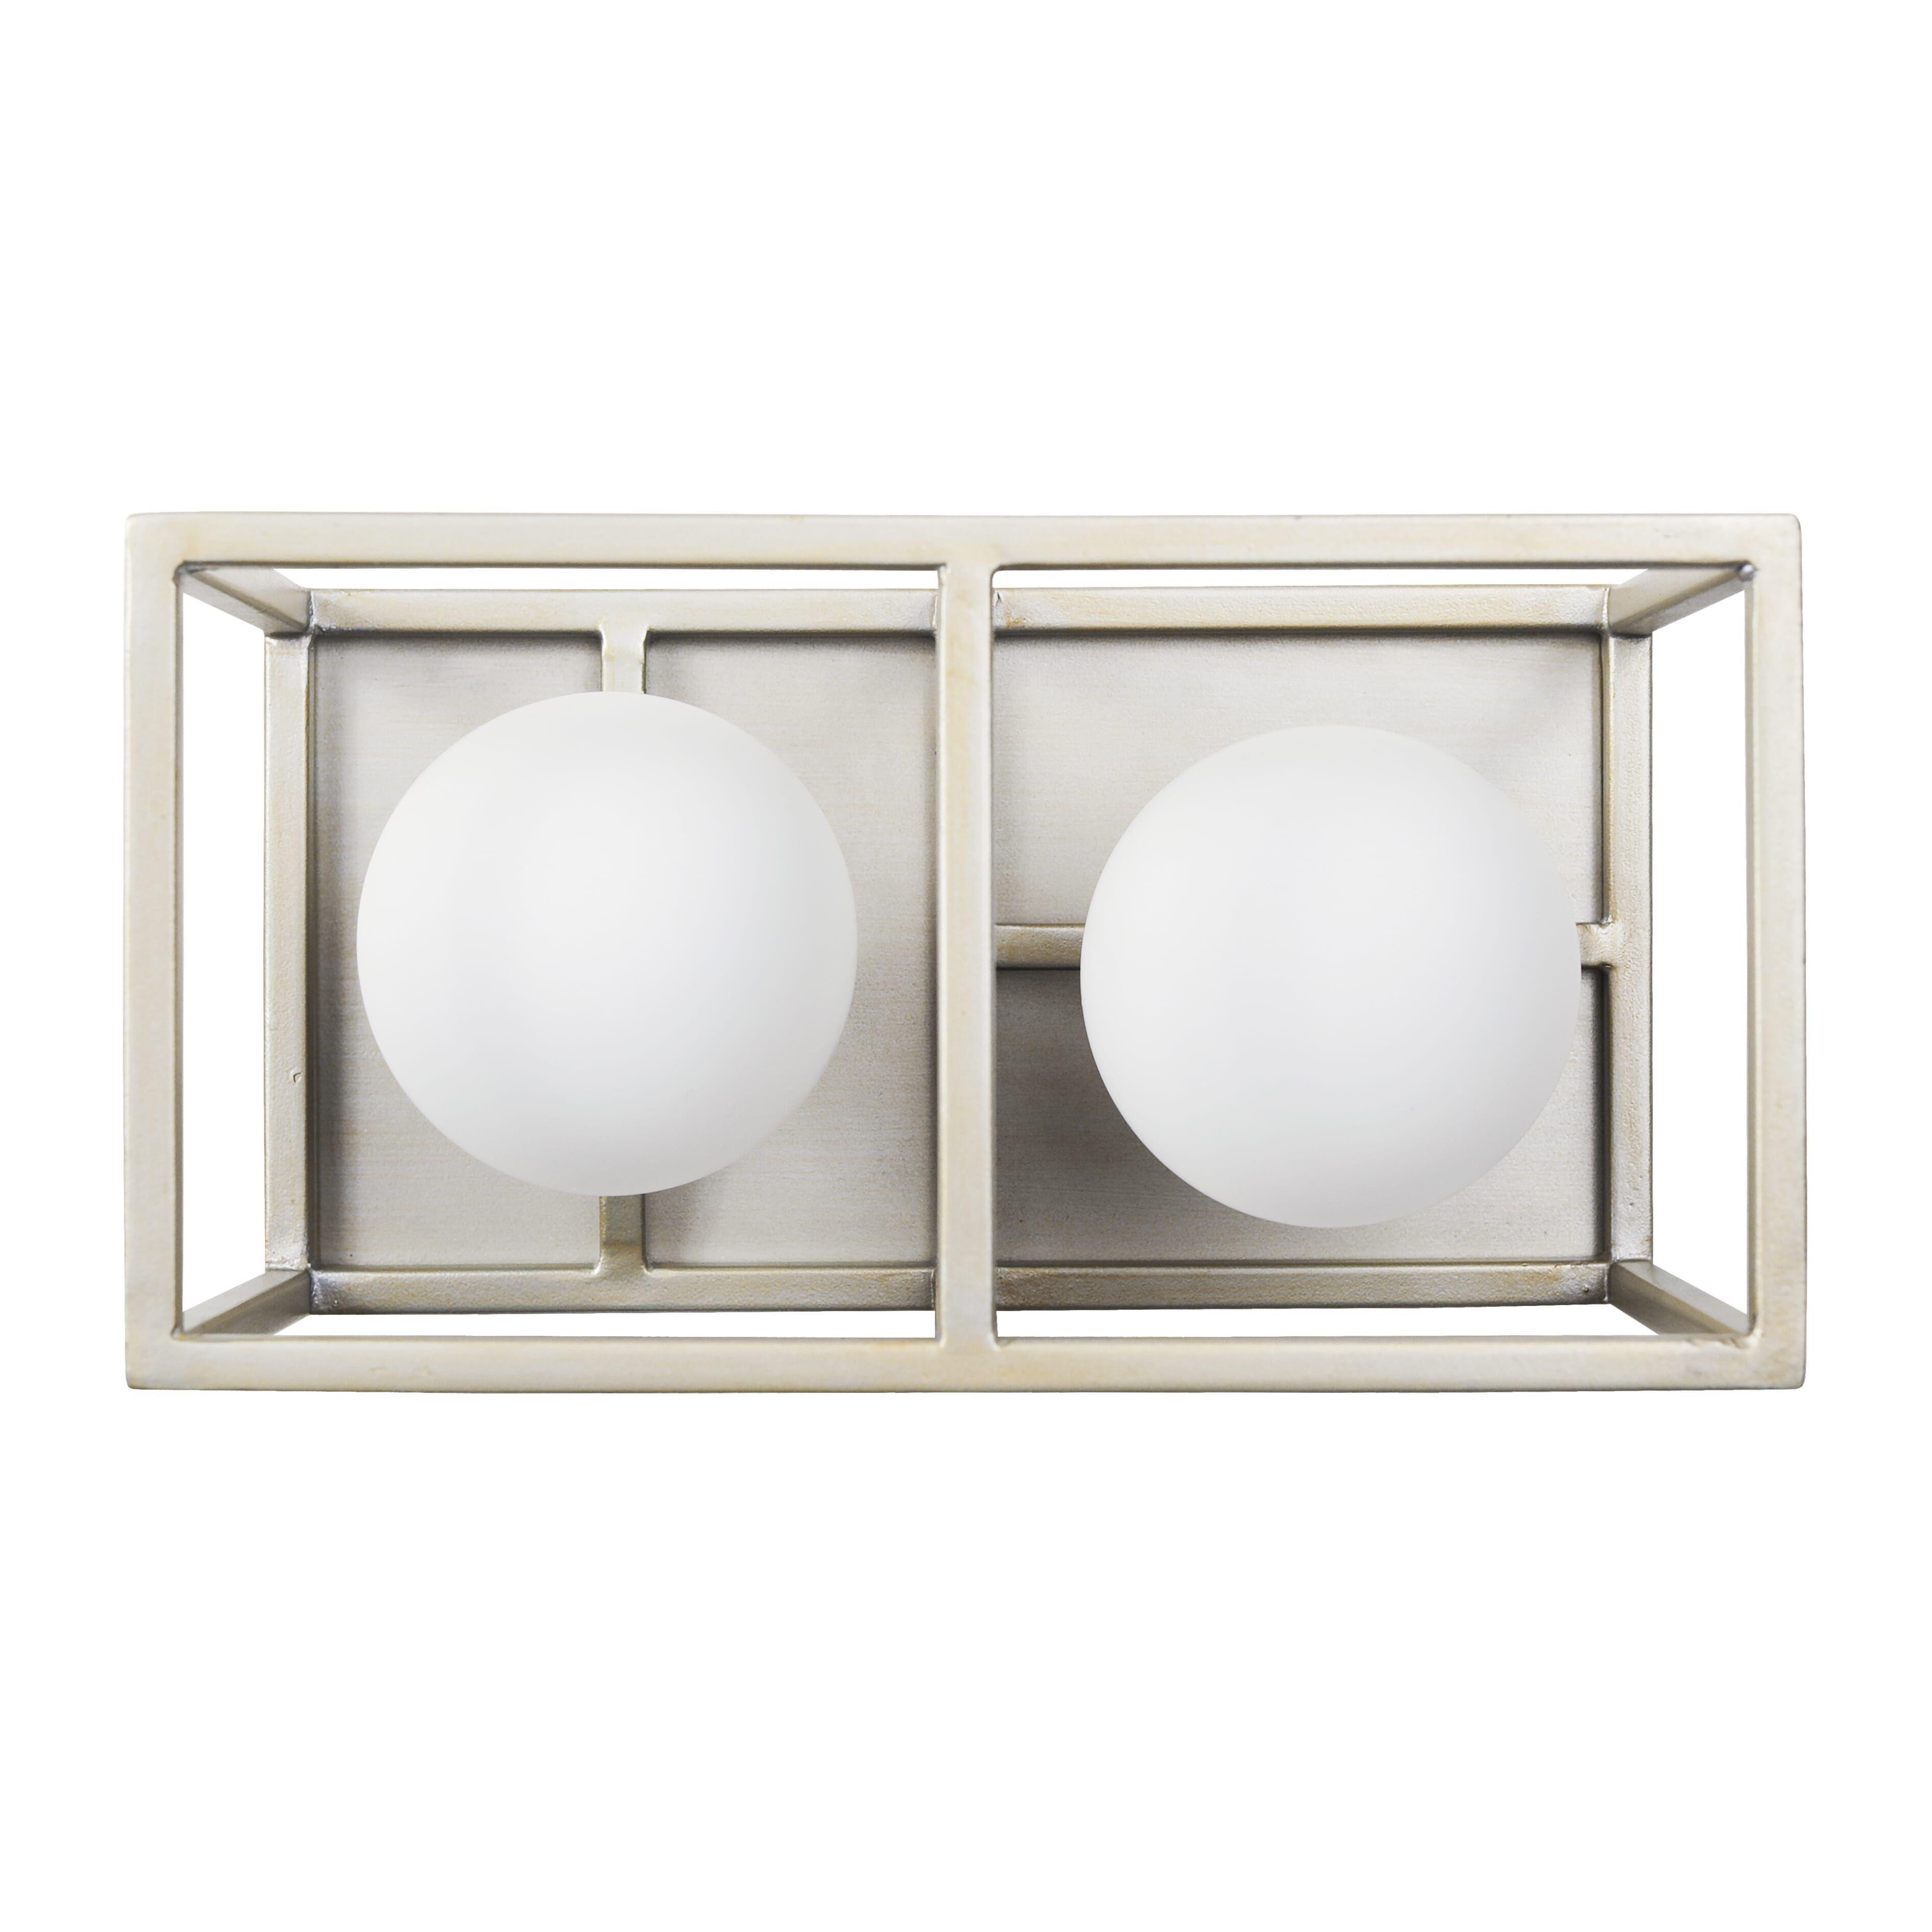 "Photo of Varaluz Plaza 2-Light 5 ""bathroom wash basin lamp in Silverado with carbon"